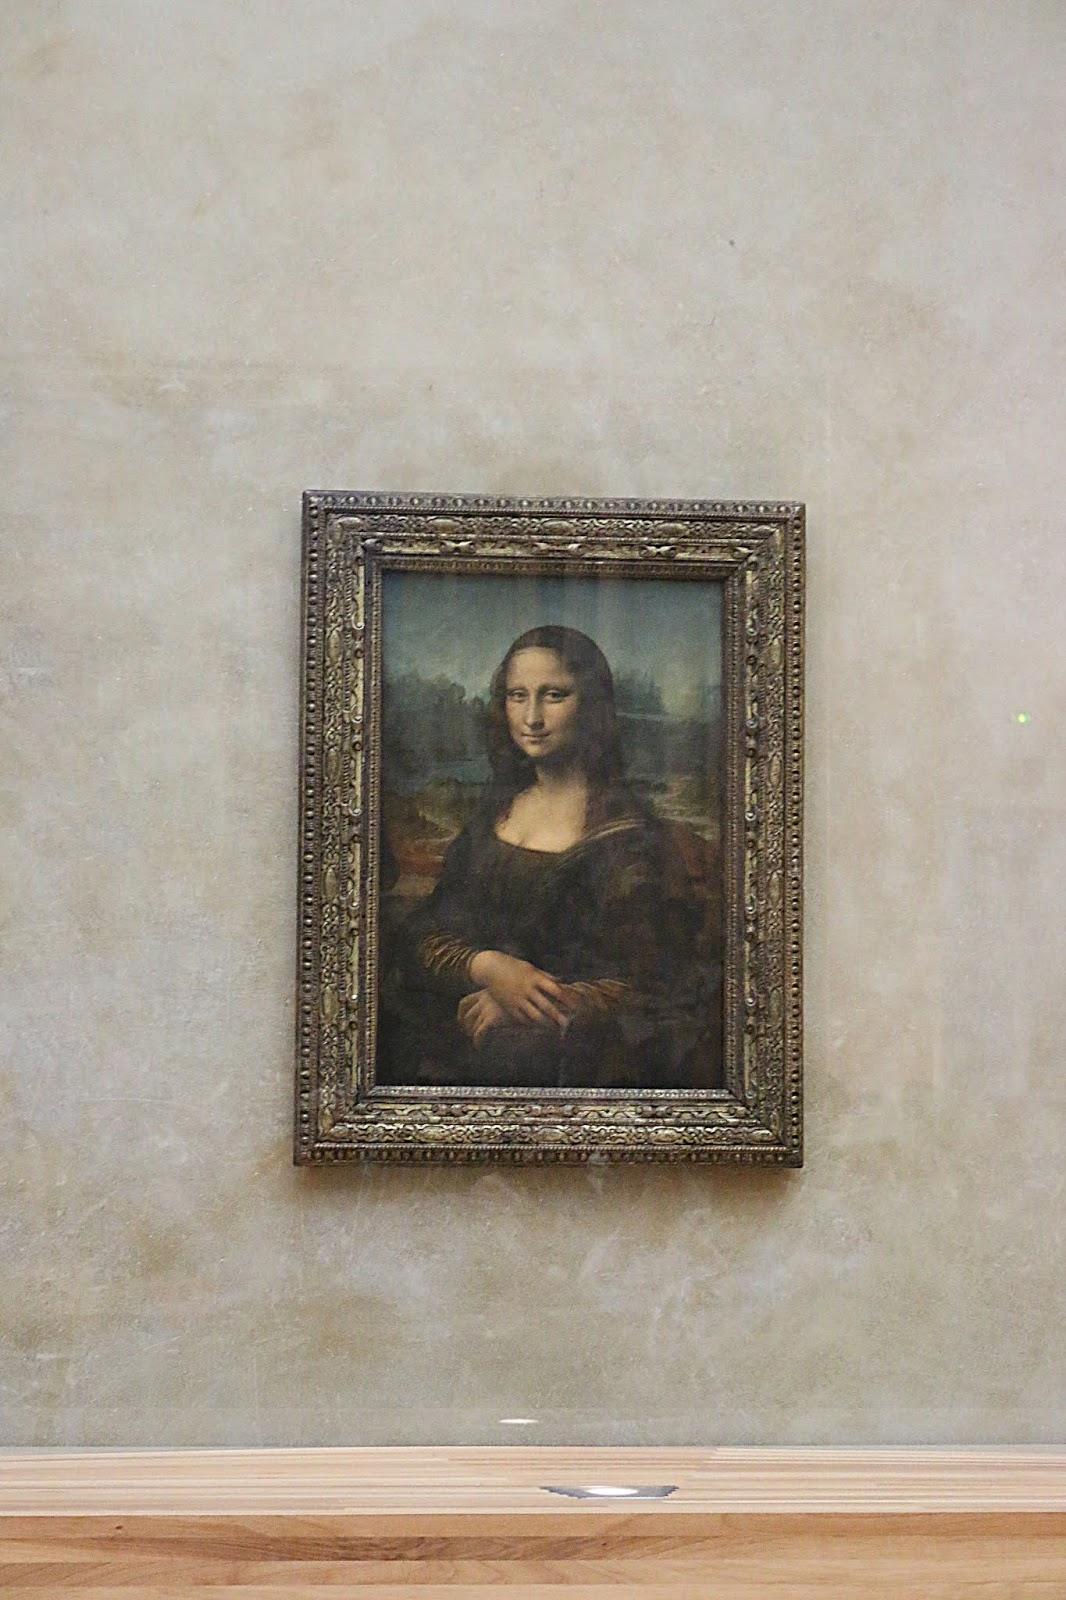 Paris Mona Lisa Louvre Museum